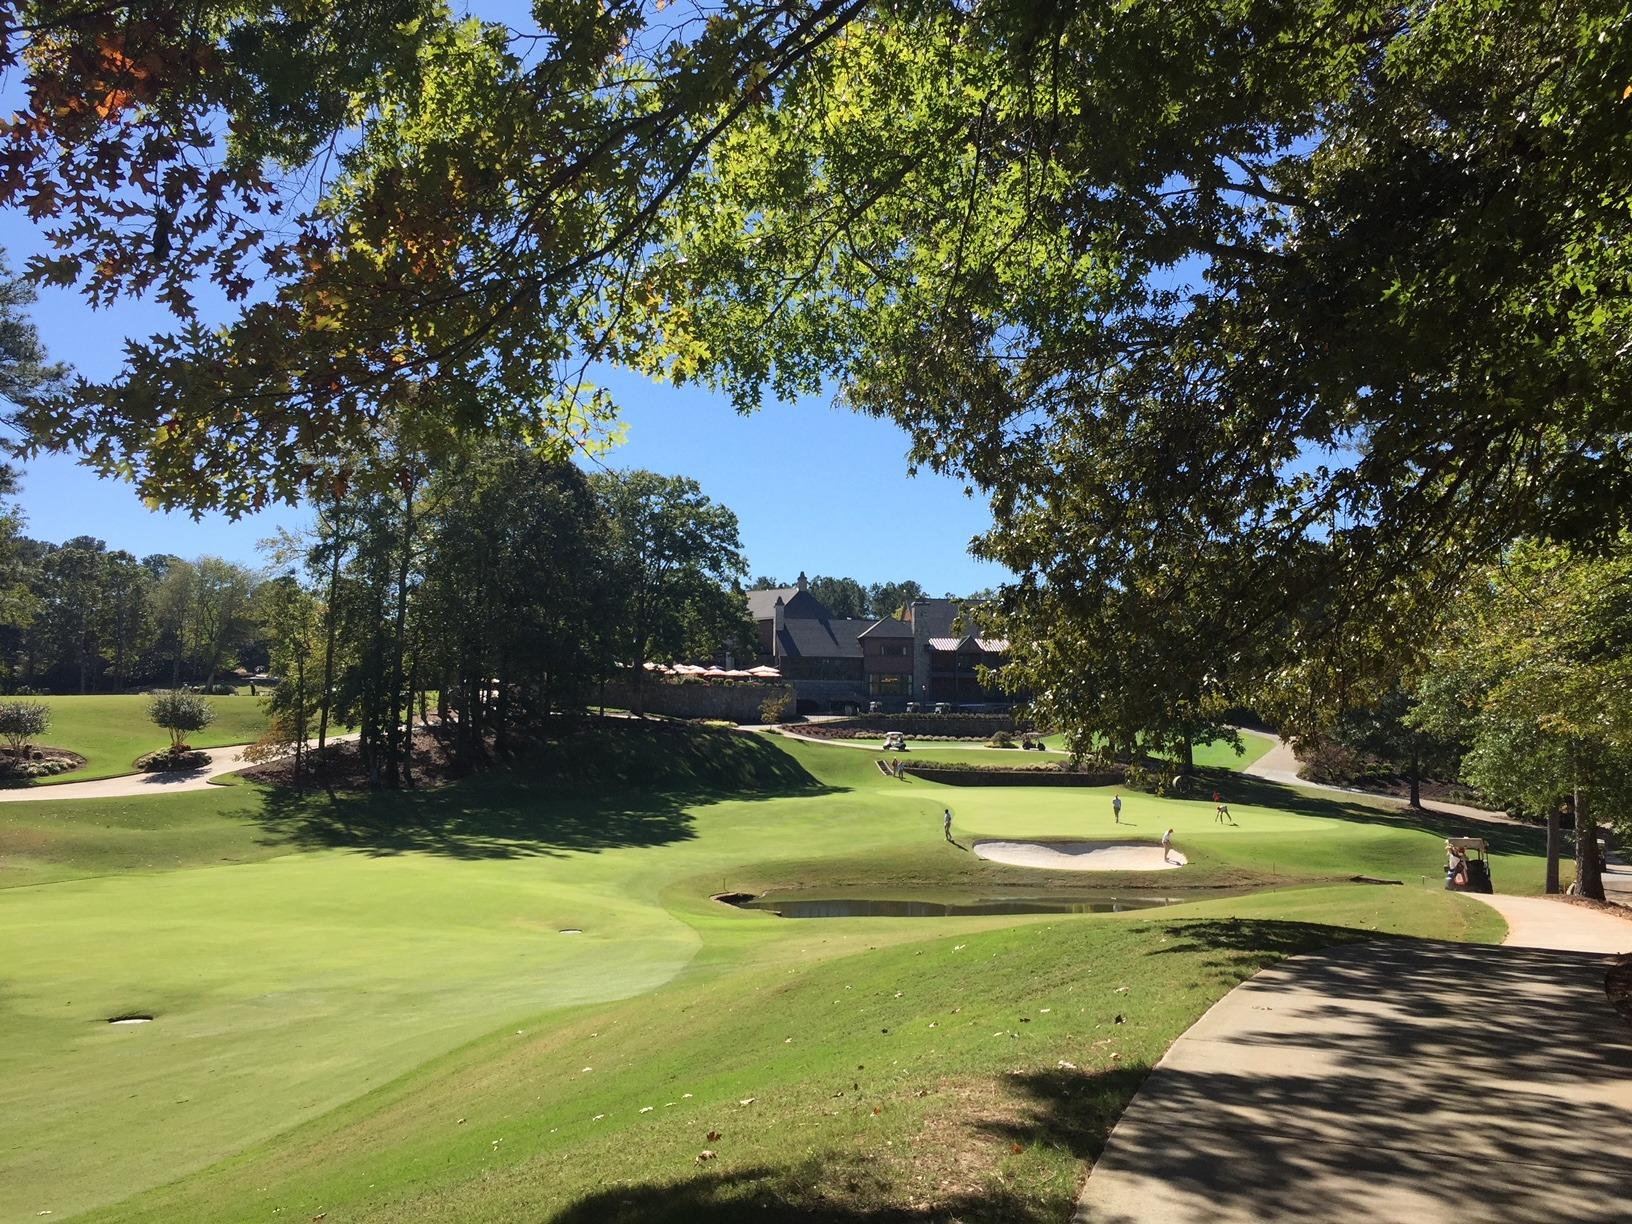 Golf Club of Georgia, October 20, 2017